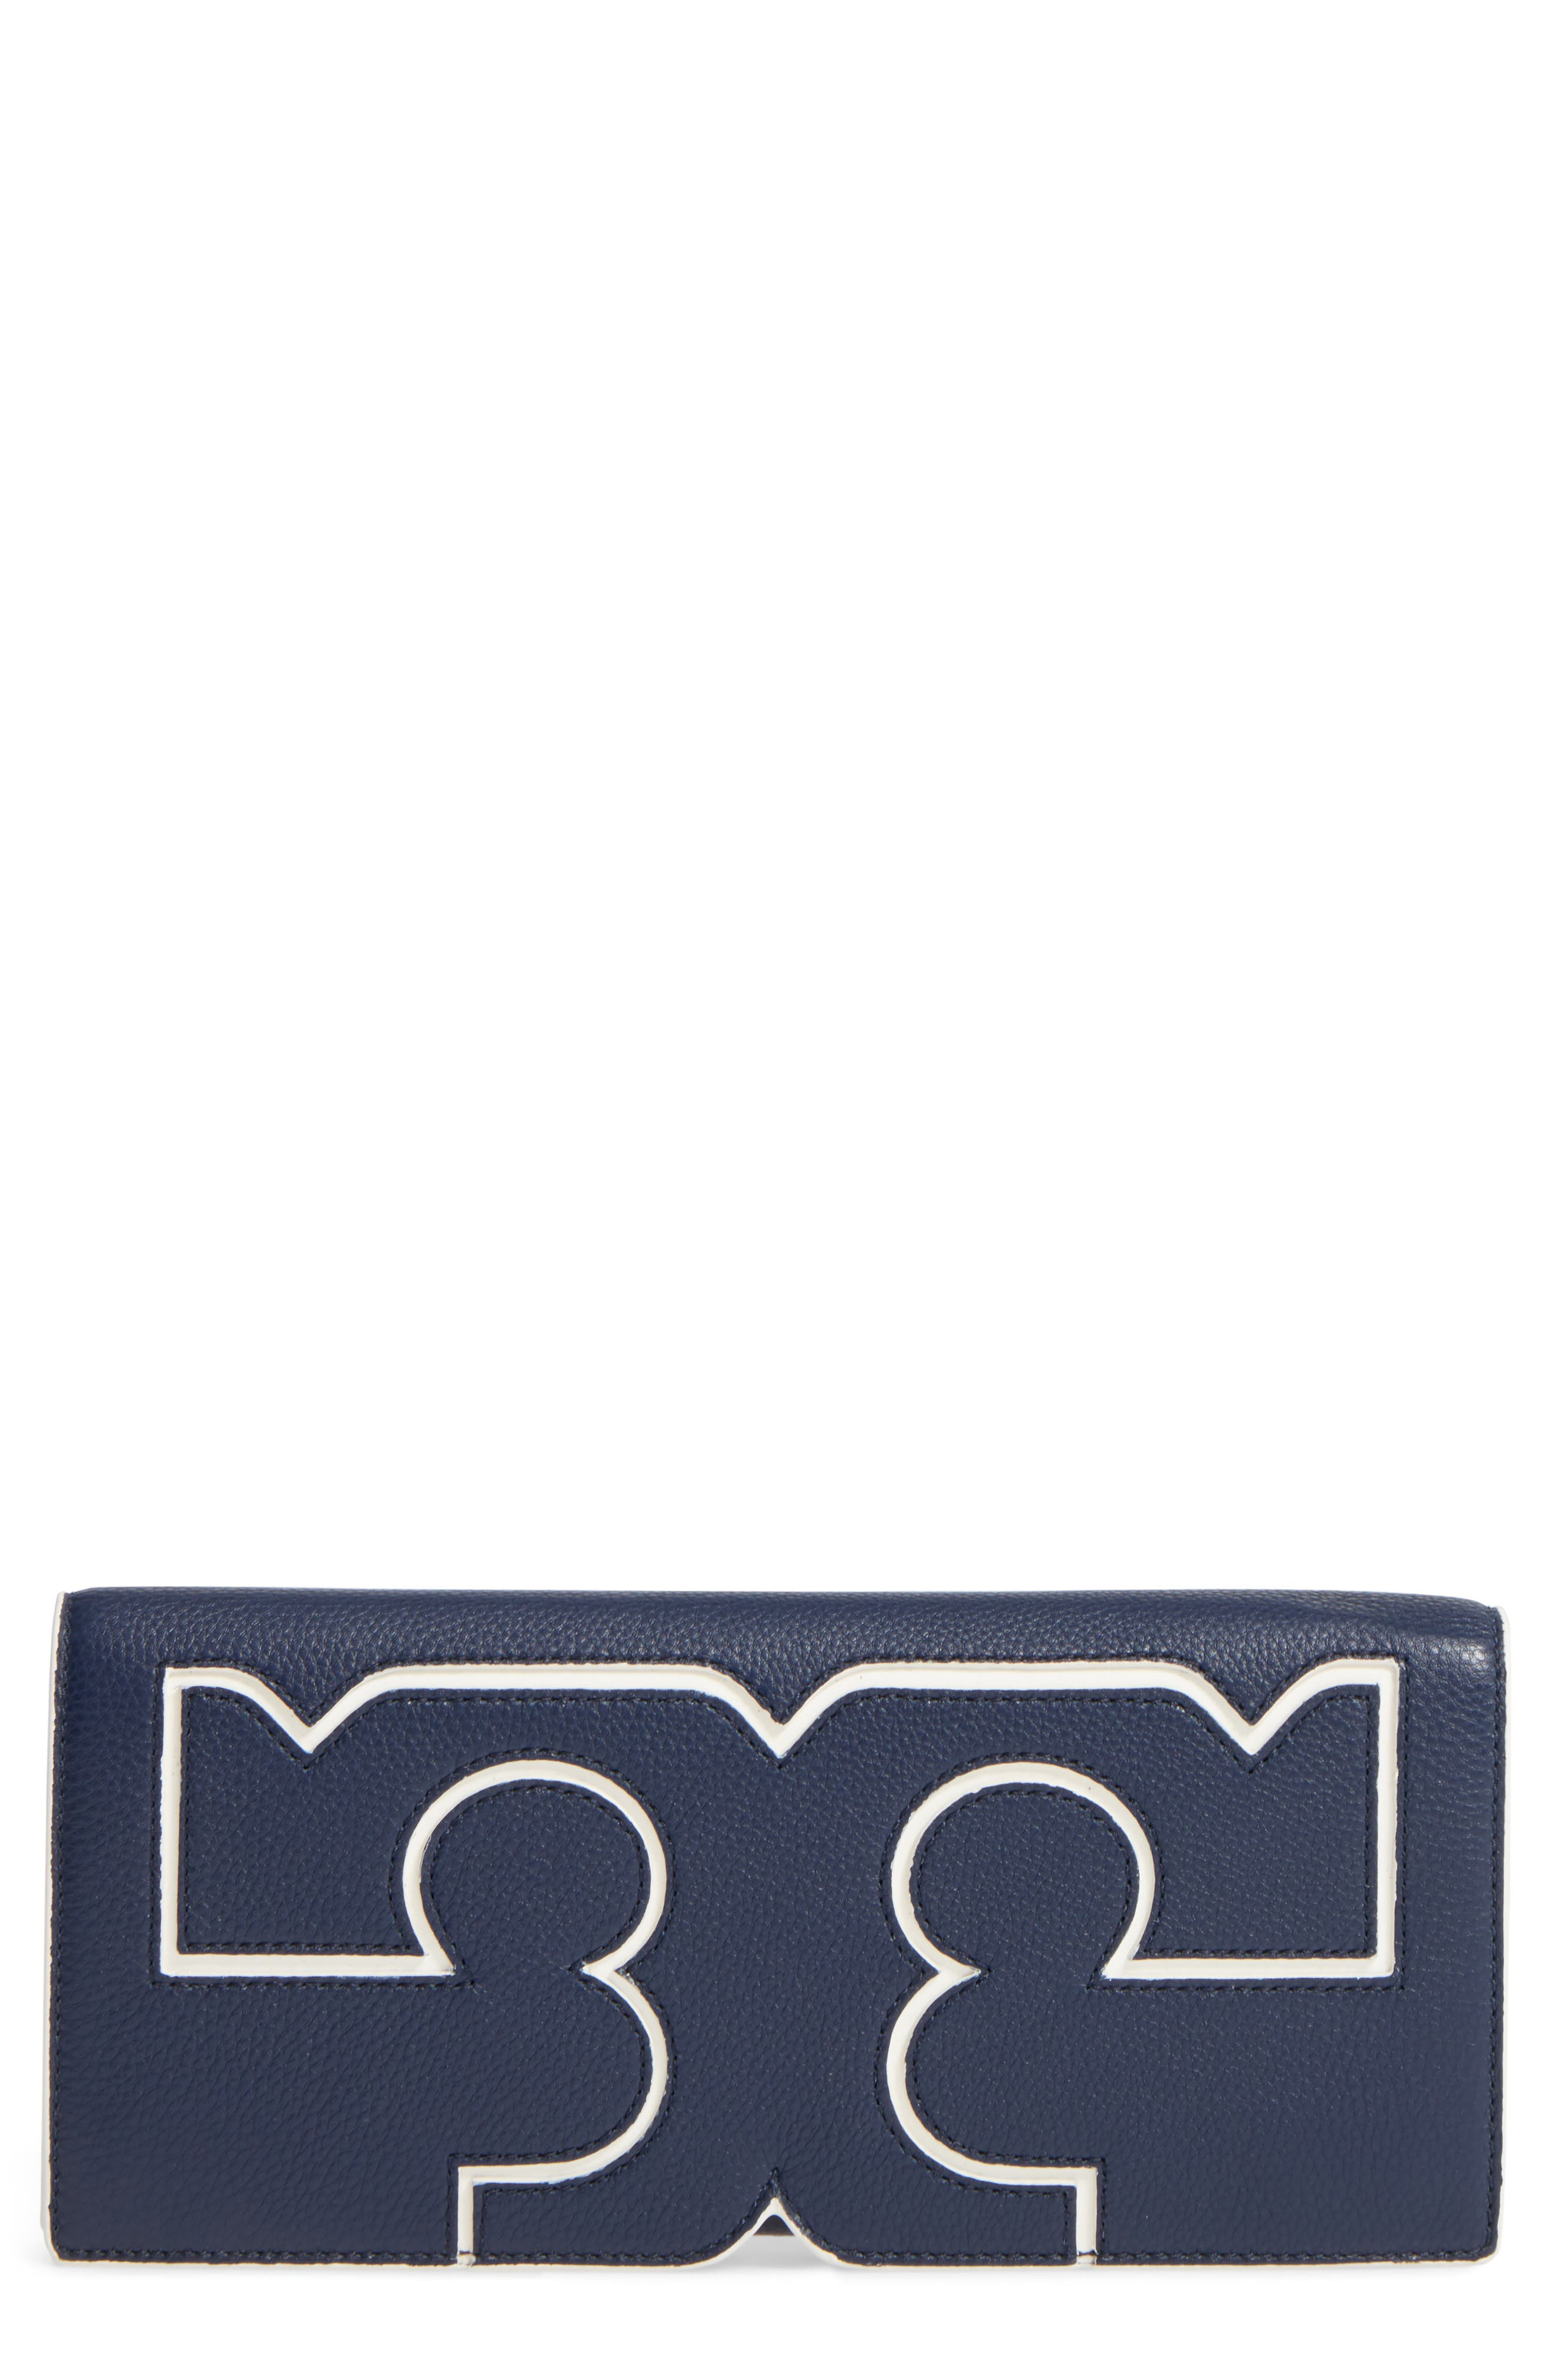 Main Image - Tory Burch Serif Leather Clutch